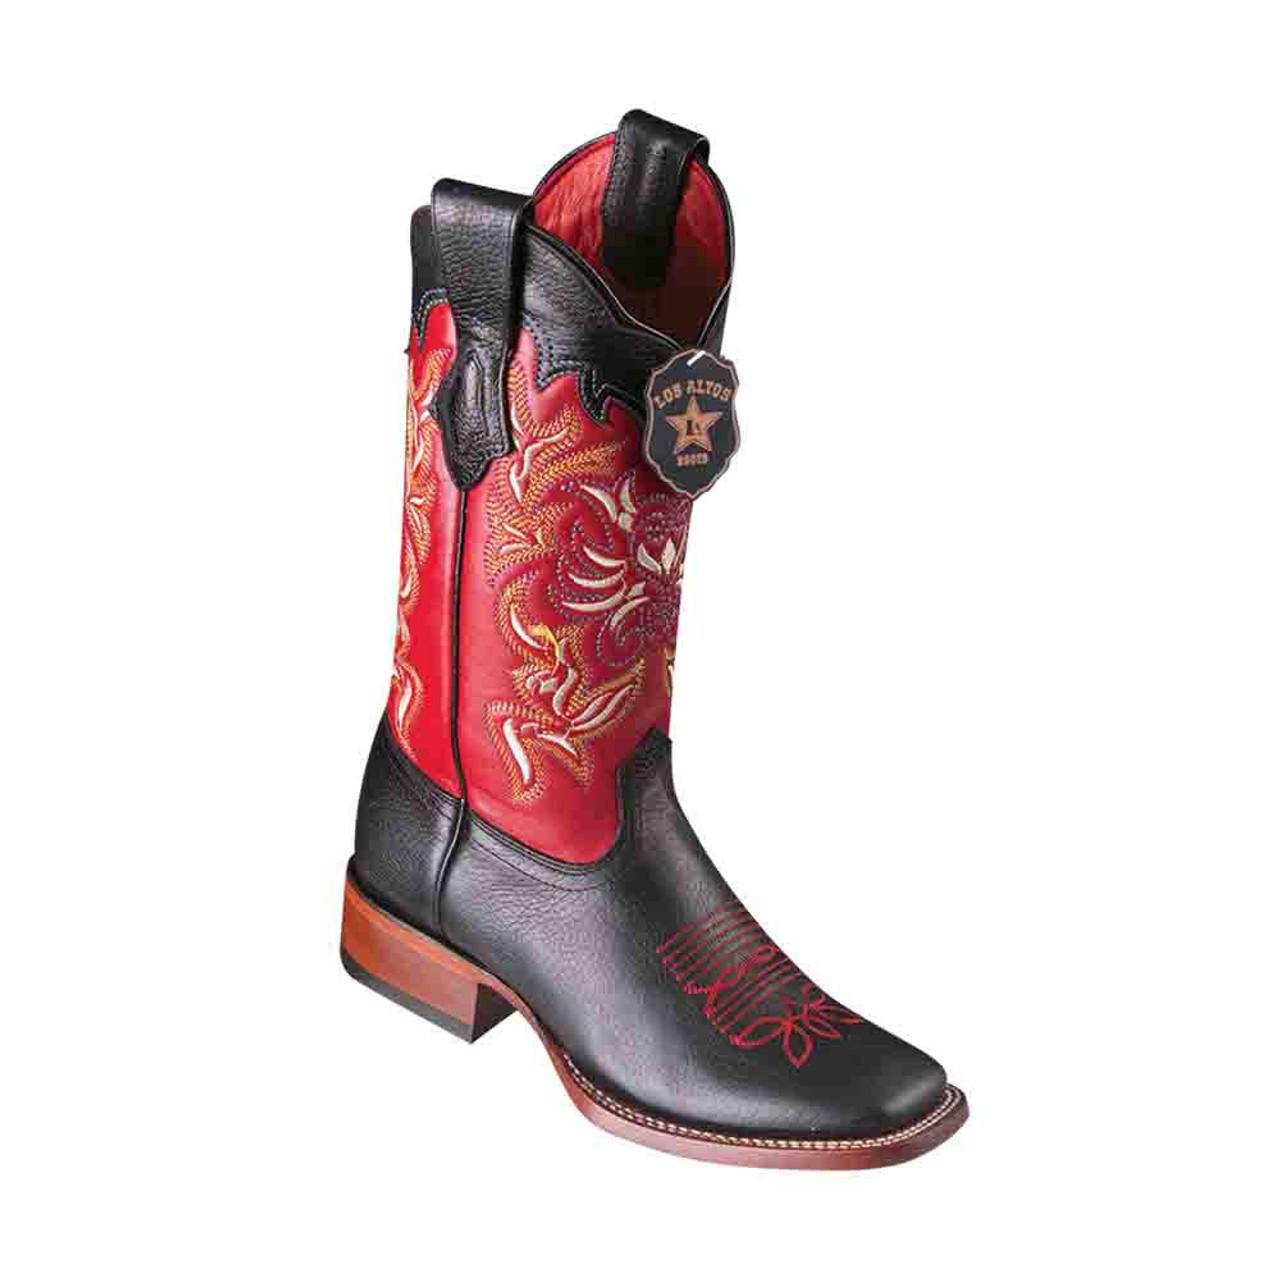 Los Altos Grisly Black \u0026 Red Leather